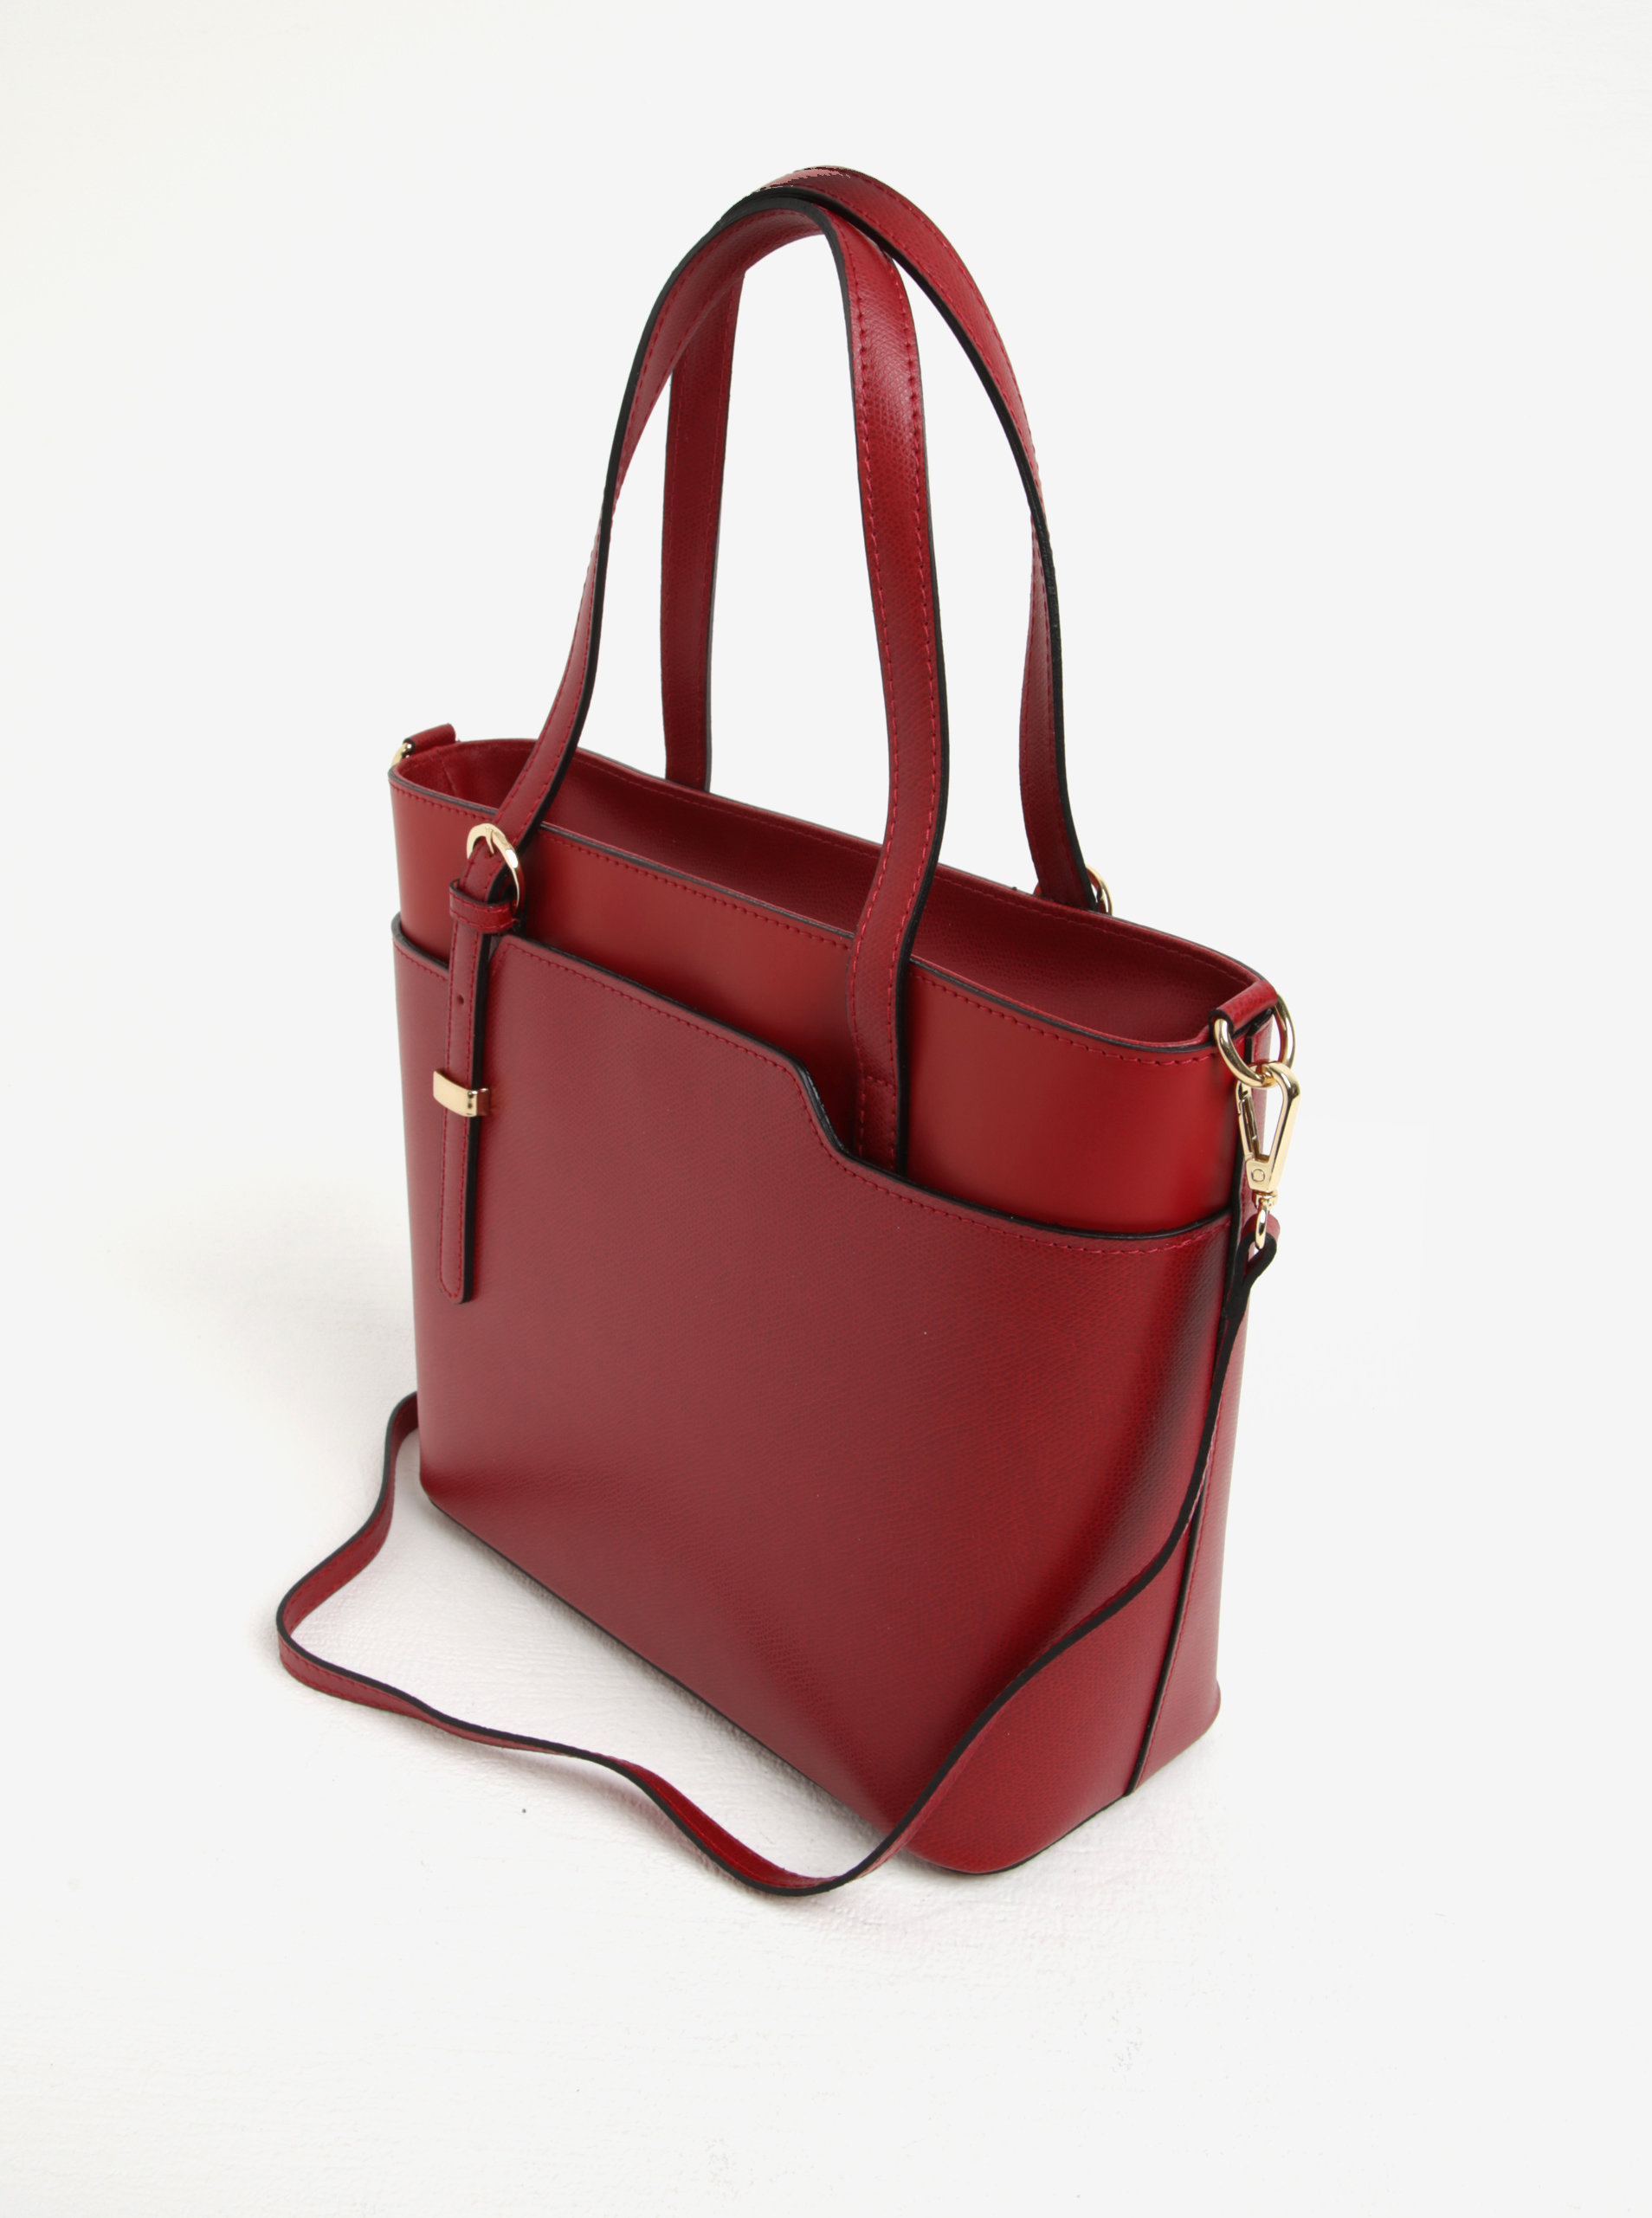 Červená dámská kožená kabelka do ruky crossbody kabelka s hadím vzorem KARA  ... aa79274be3c